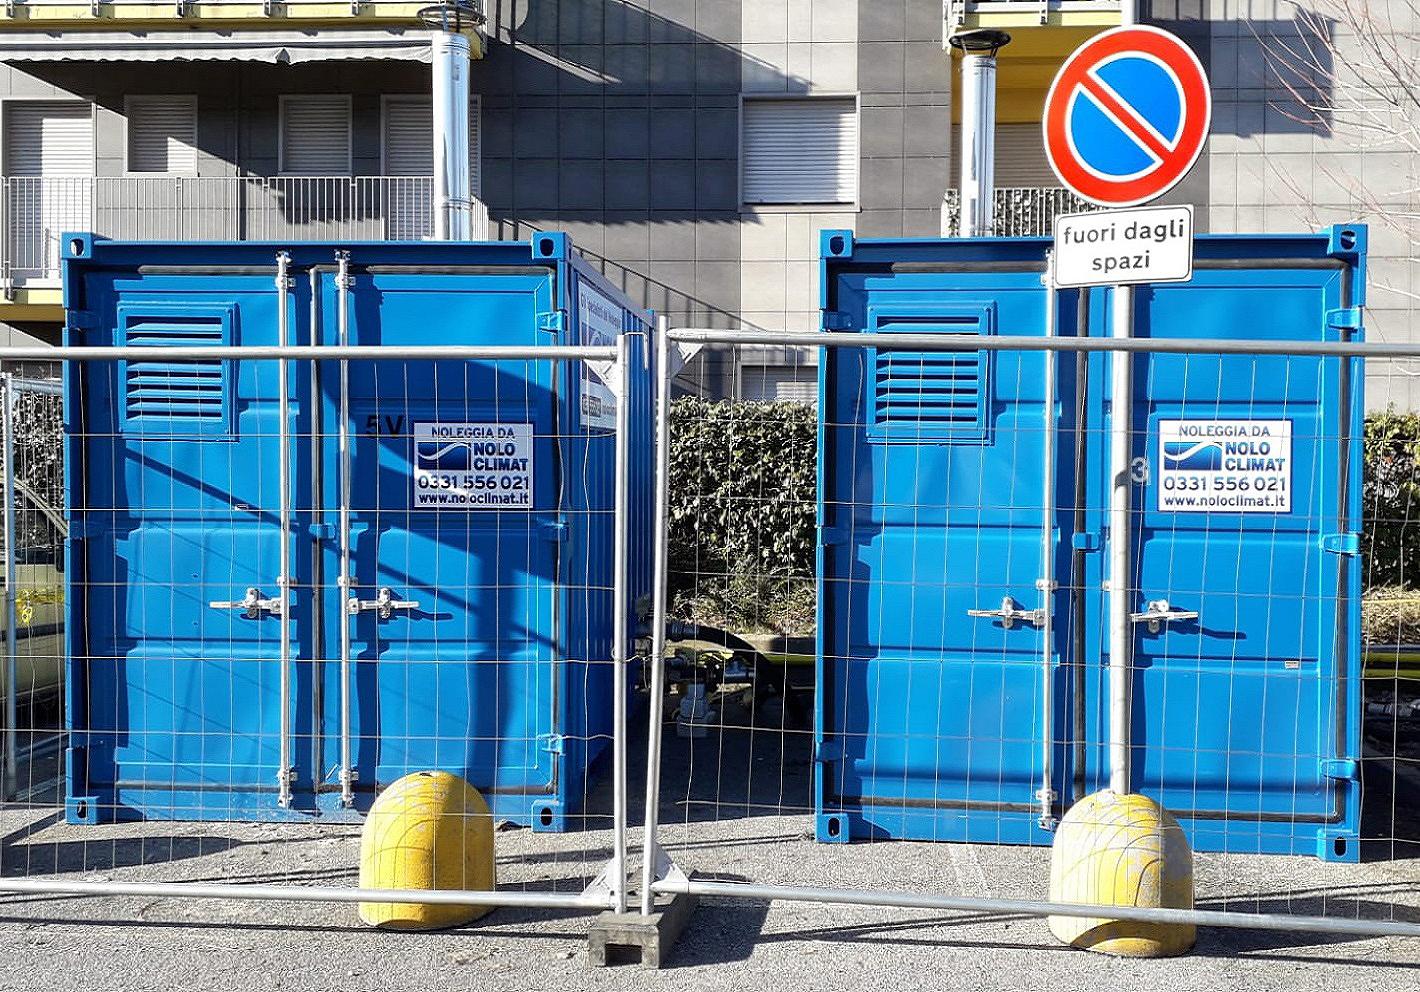 Caldaie forniscono acqua calda sanitaria e riscaldamento a due condomini